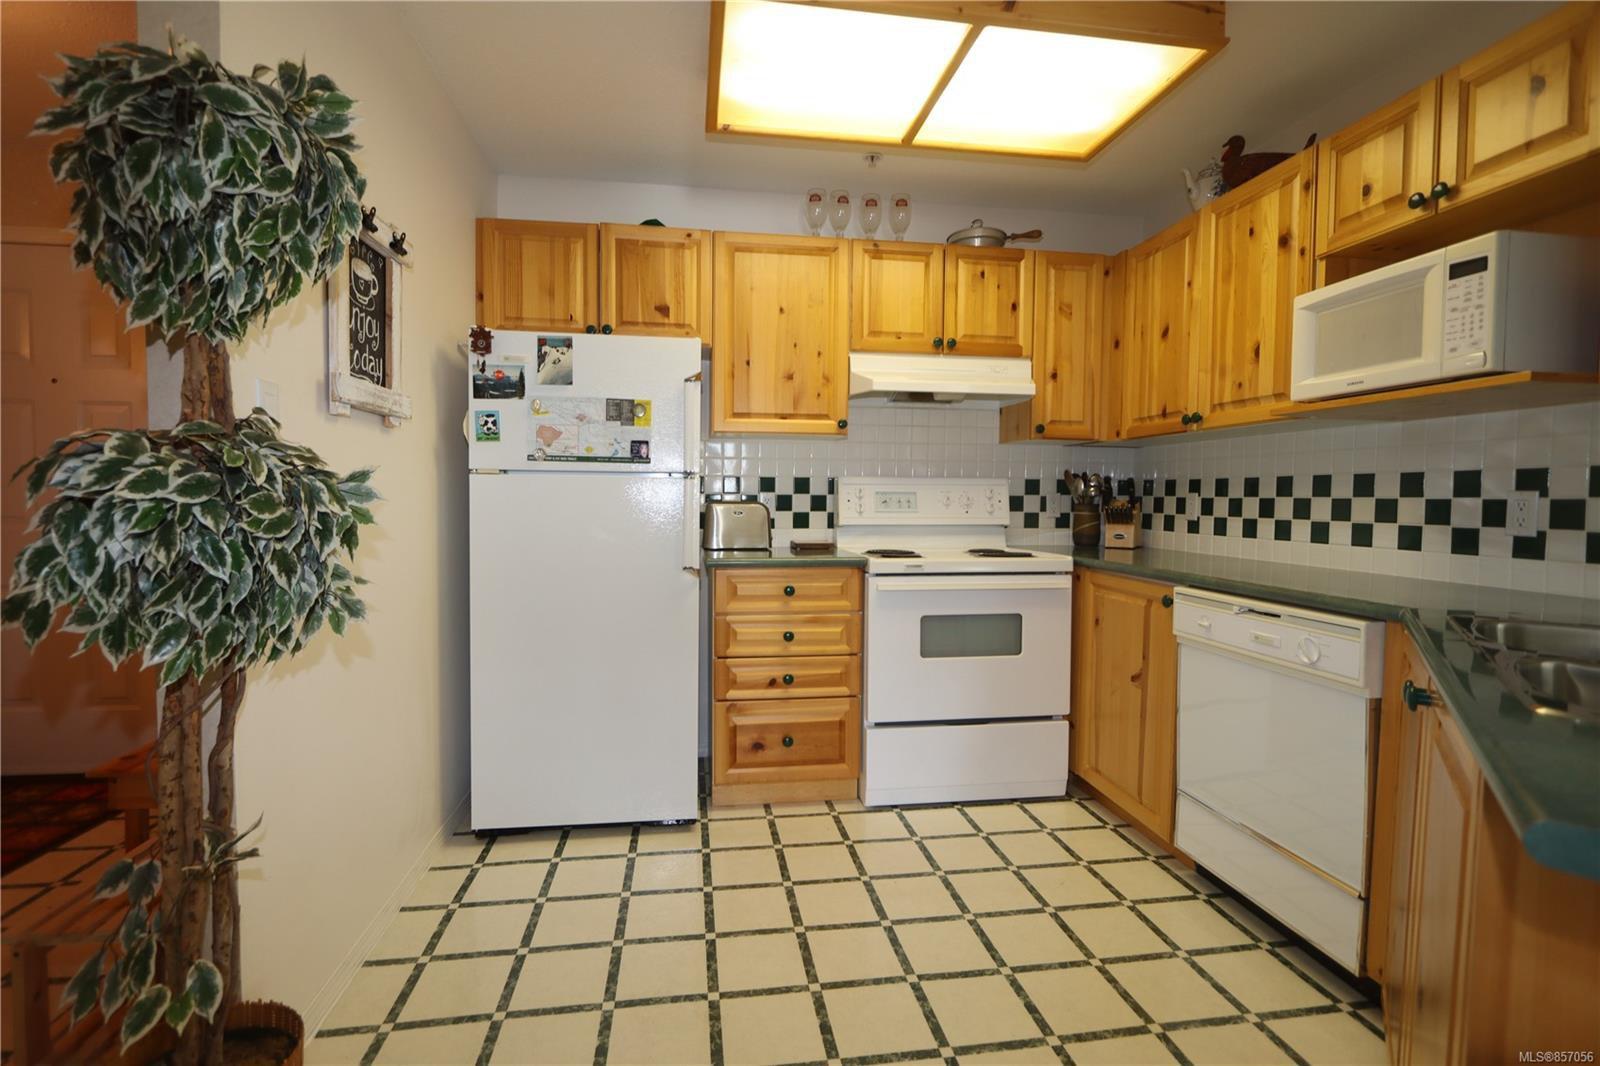 Photo 10: Photos: 118 1320 Henry Rd in : CV Mt Washington Condo for sale (Comox Valley)  : MLS®# 857056